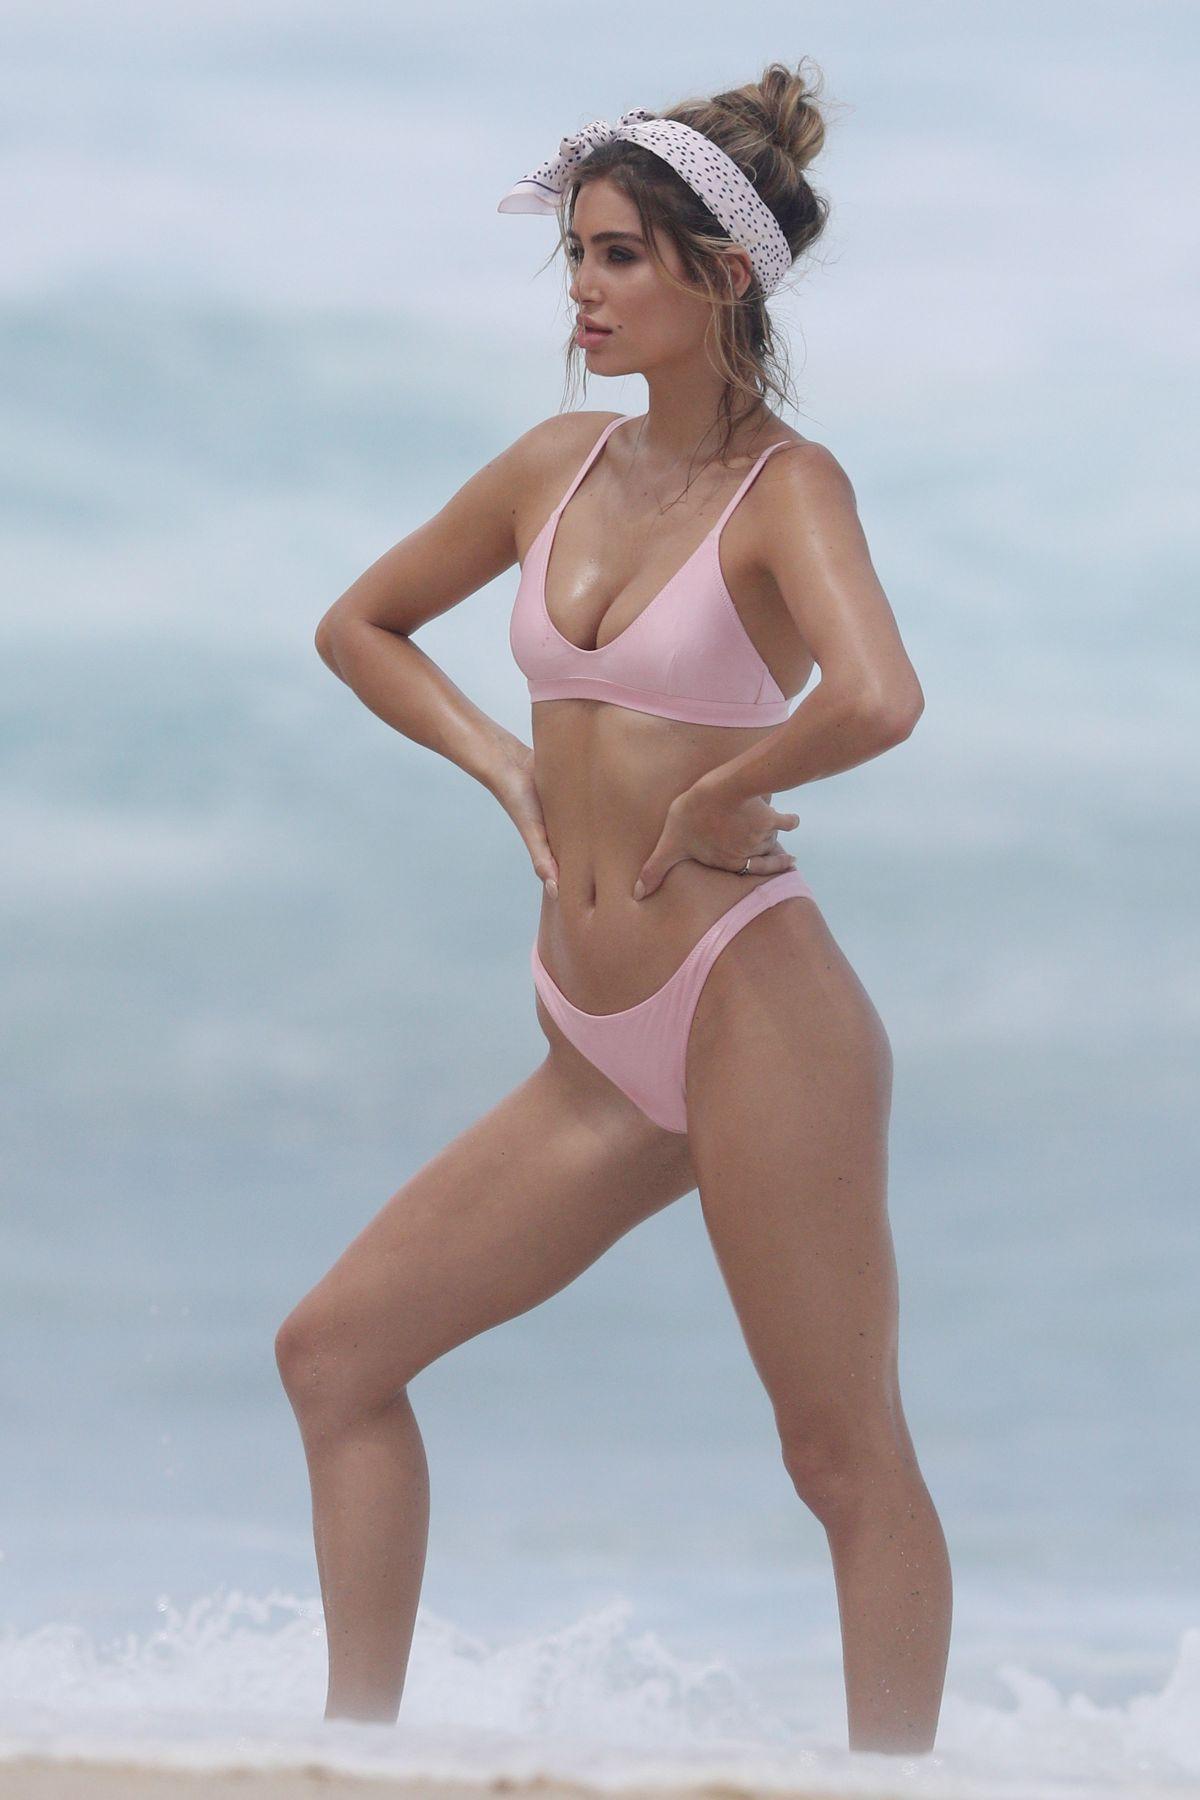 Bella Lucia Bikini Photoshoot on Bronte Beach Pic 8 of 35